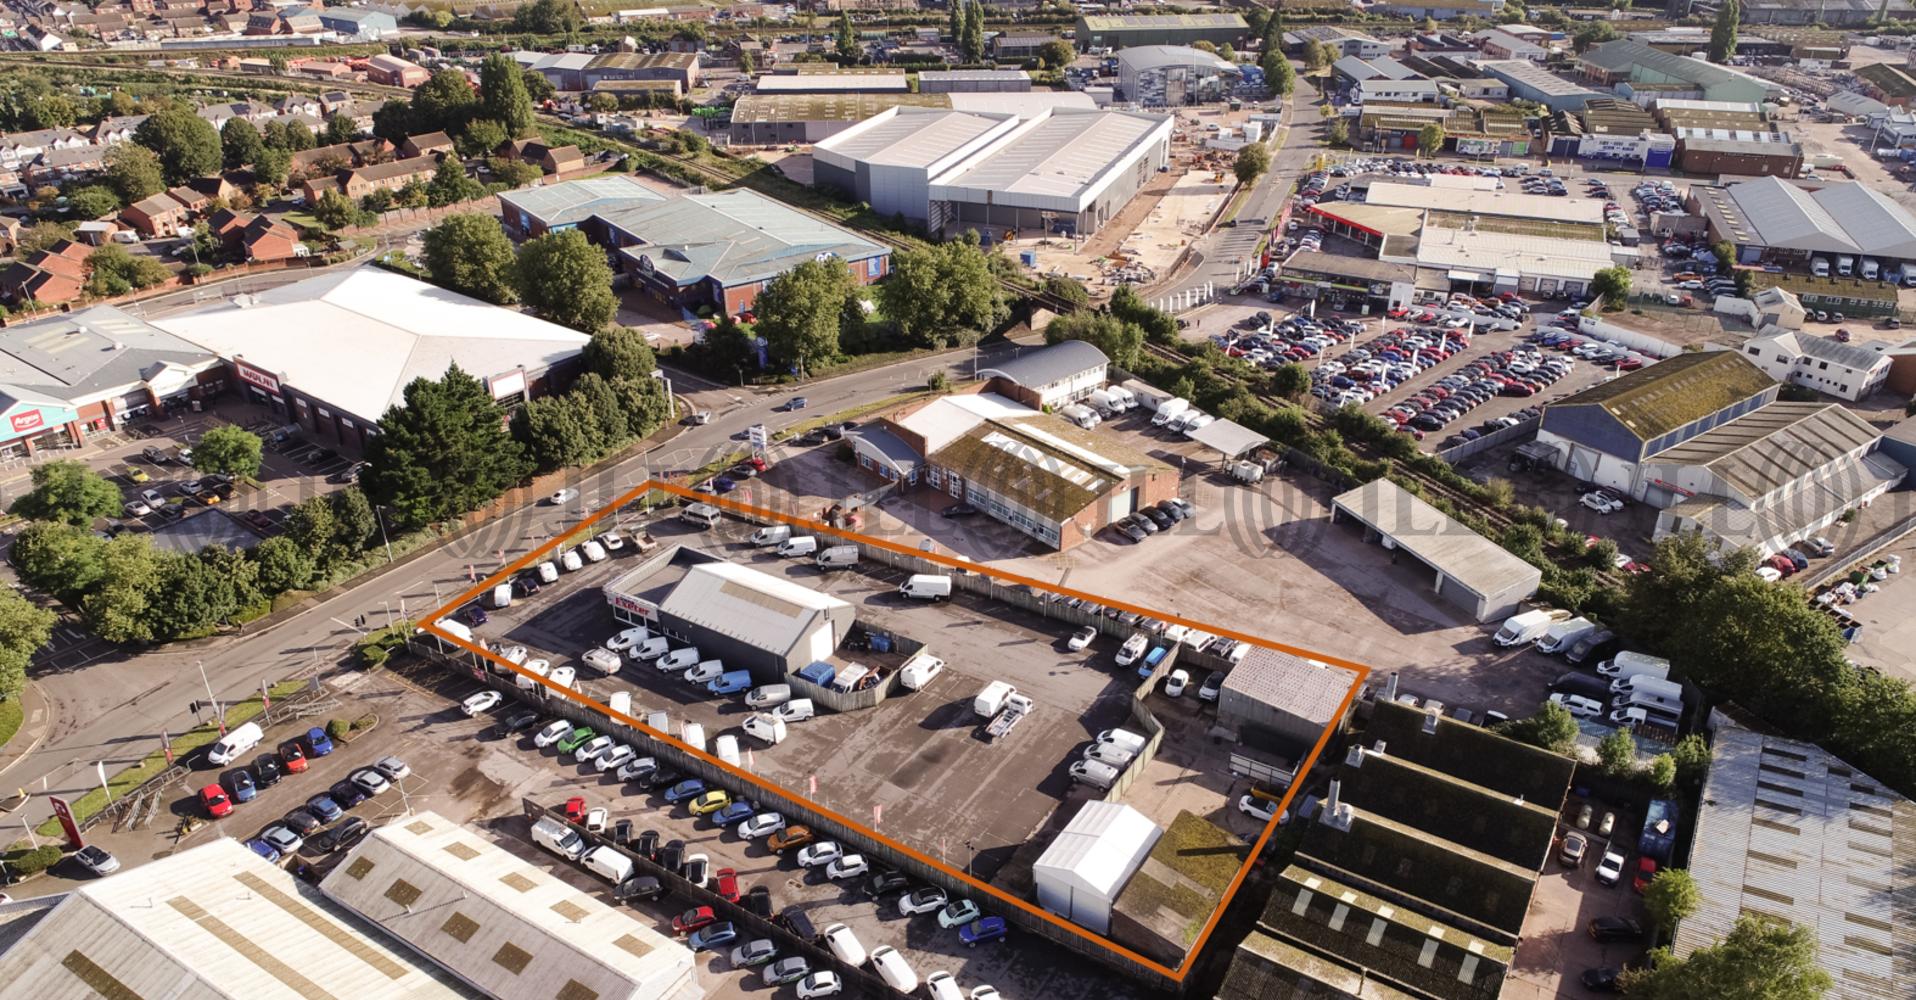 Industrial Exeter, marsh barton trading estate, EX2 8LW - 10 MBR